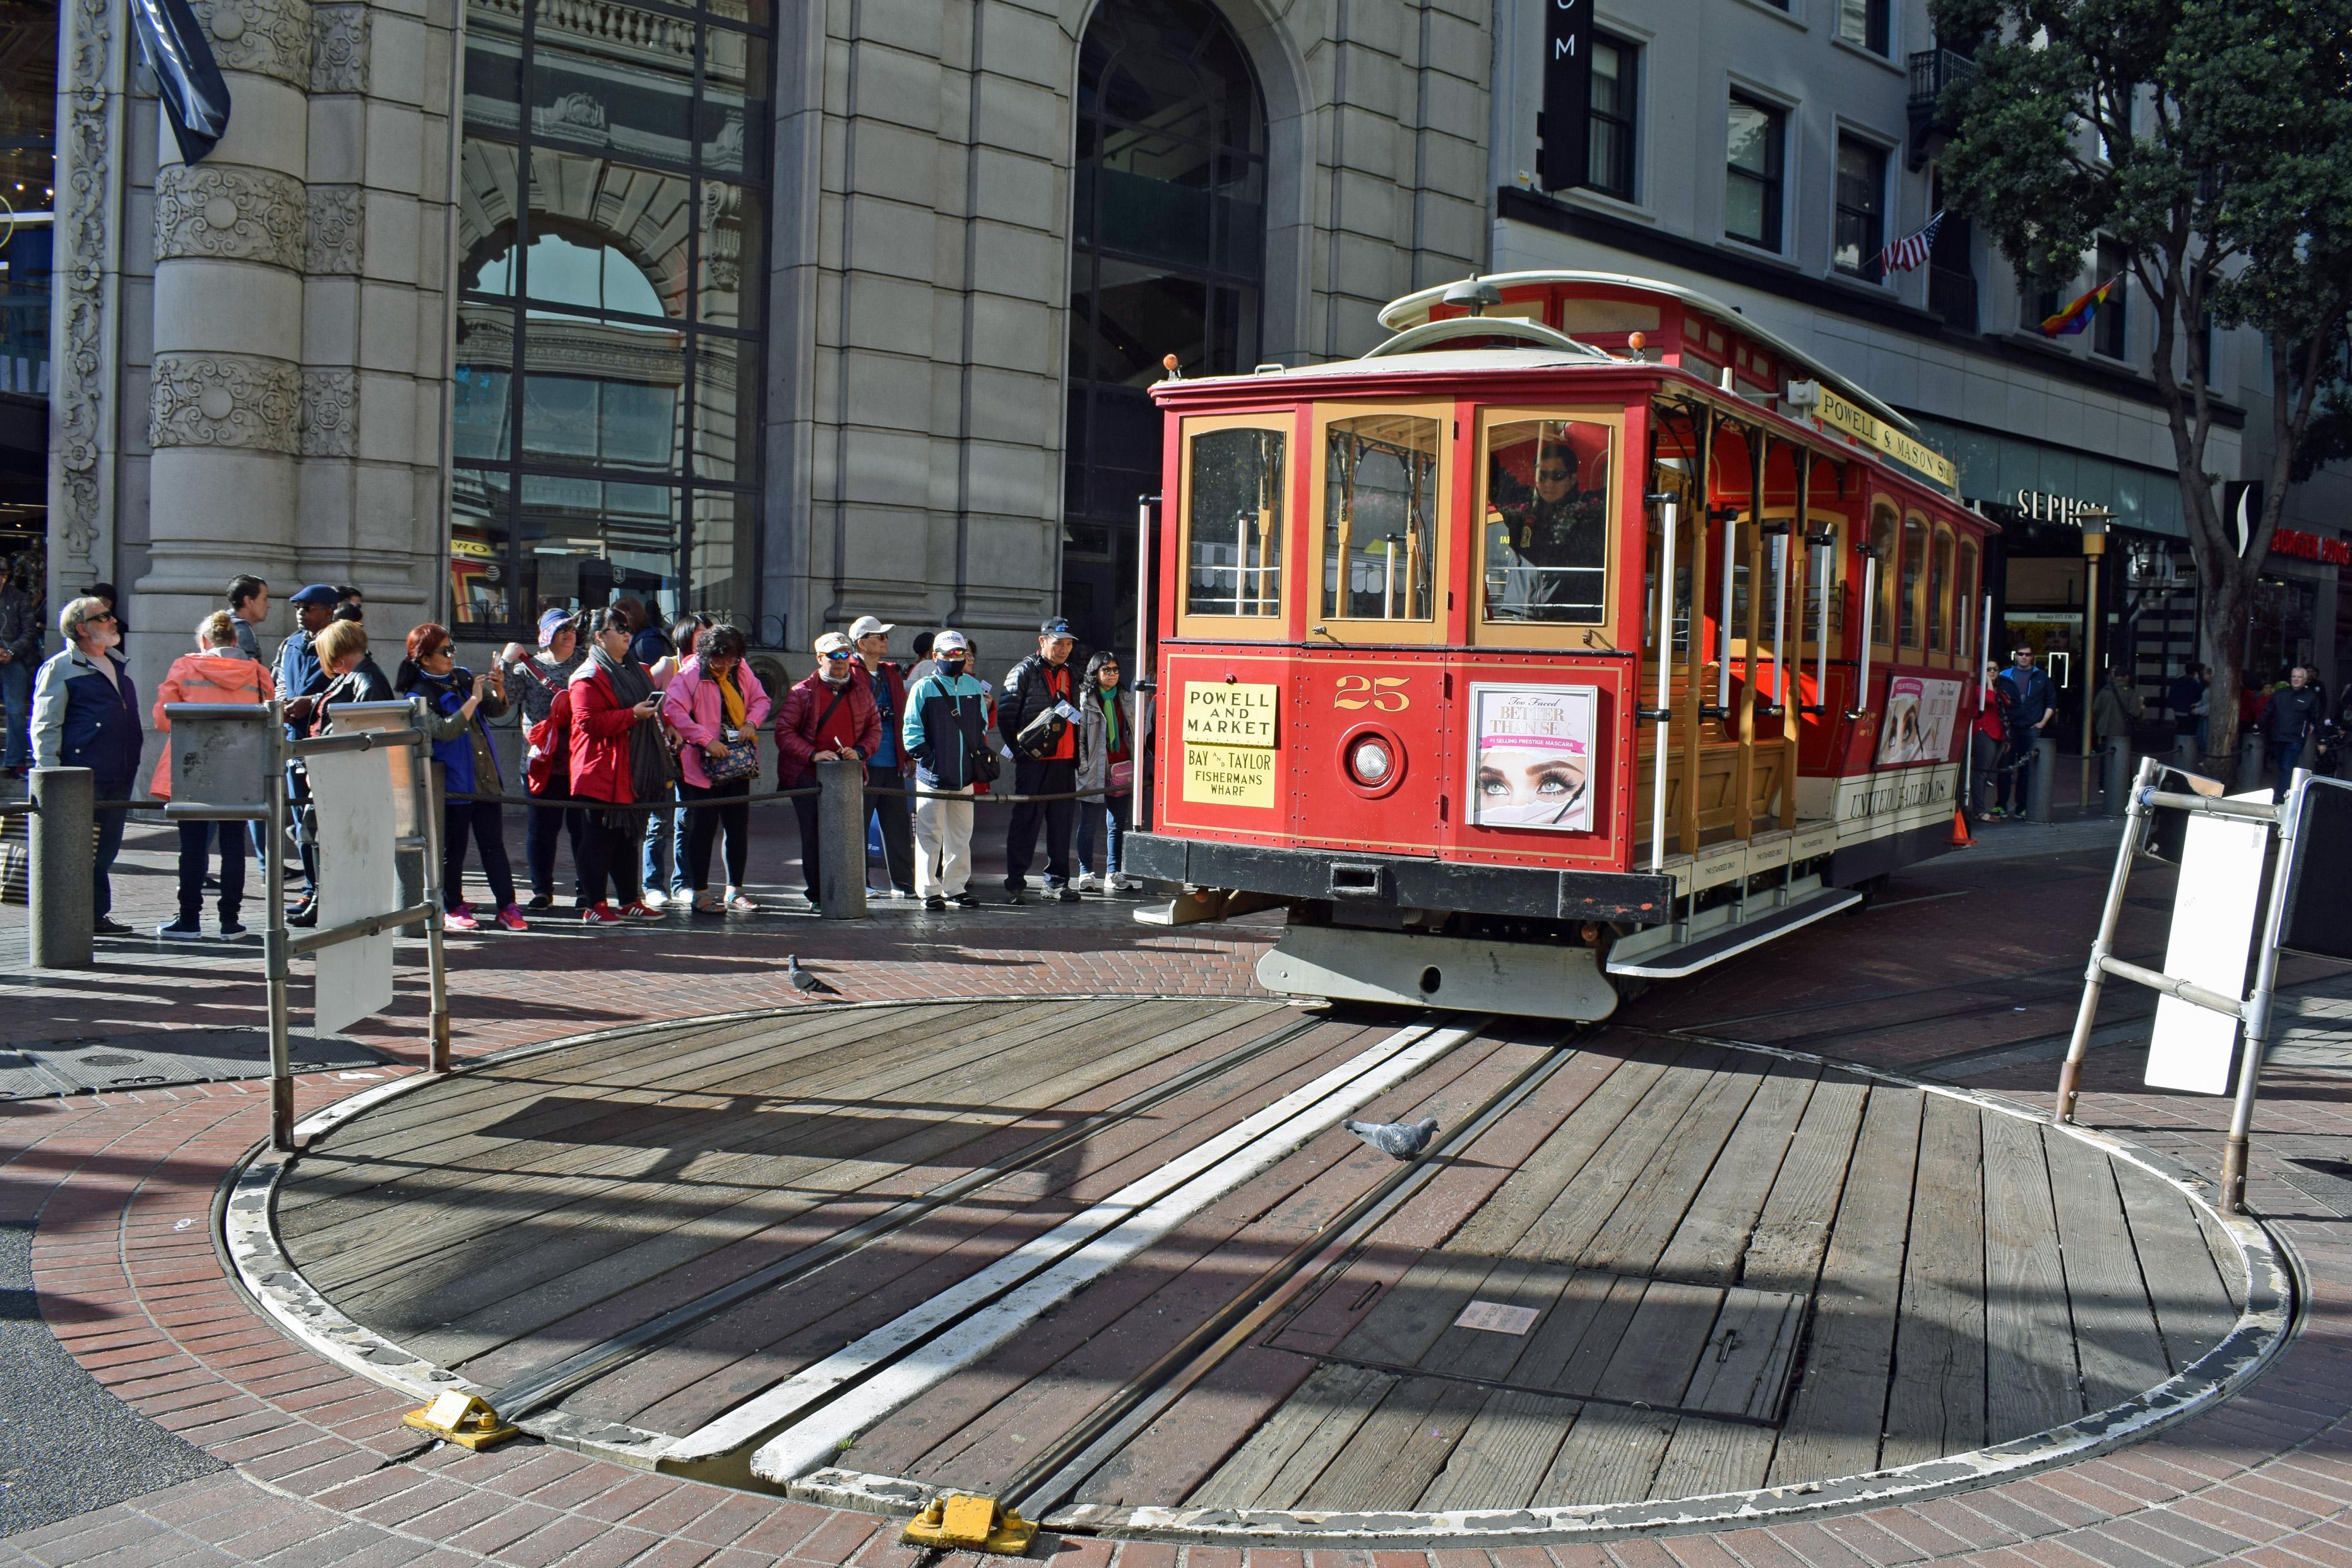 Powell and Market Street Cable Car San Francisco California USA